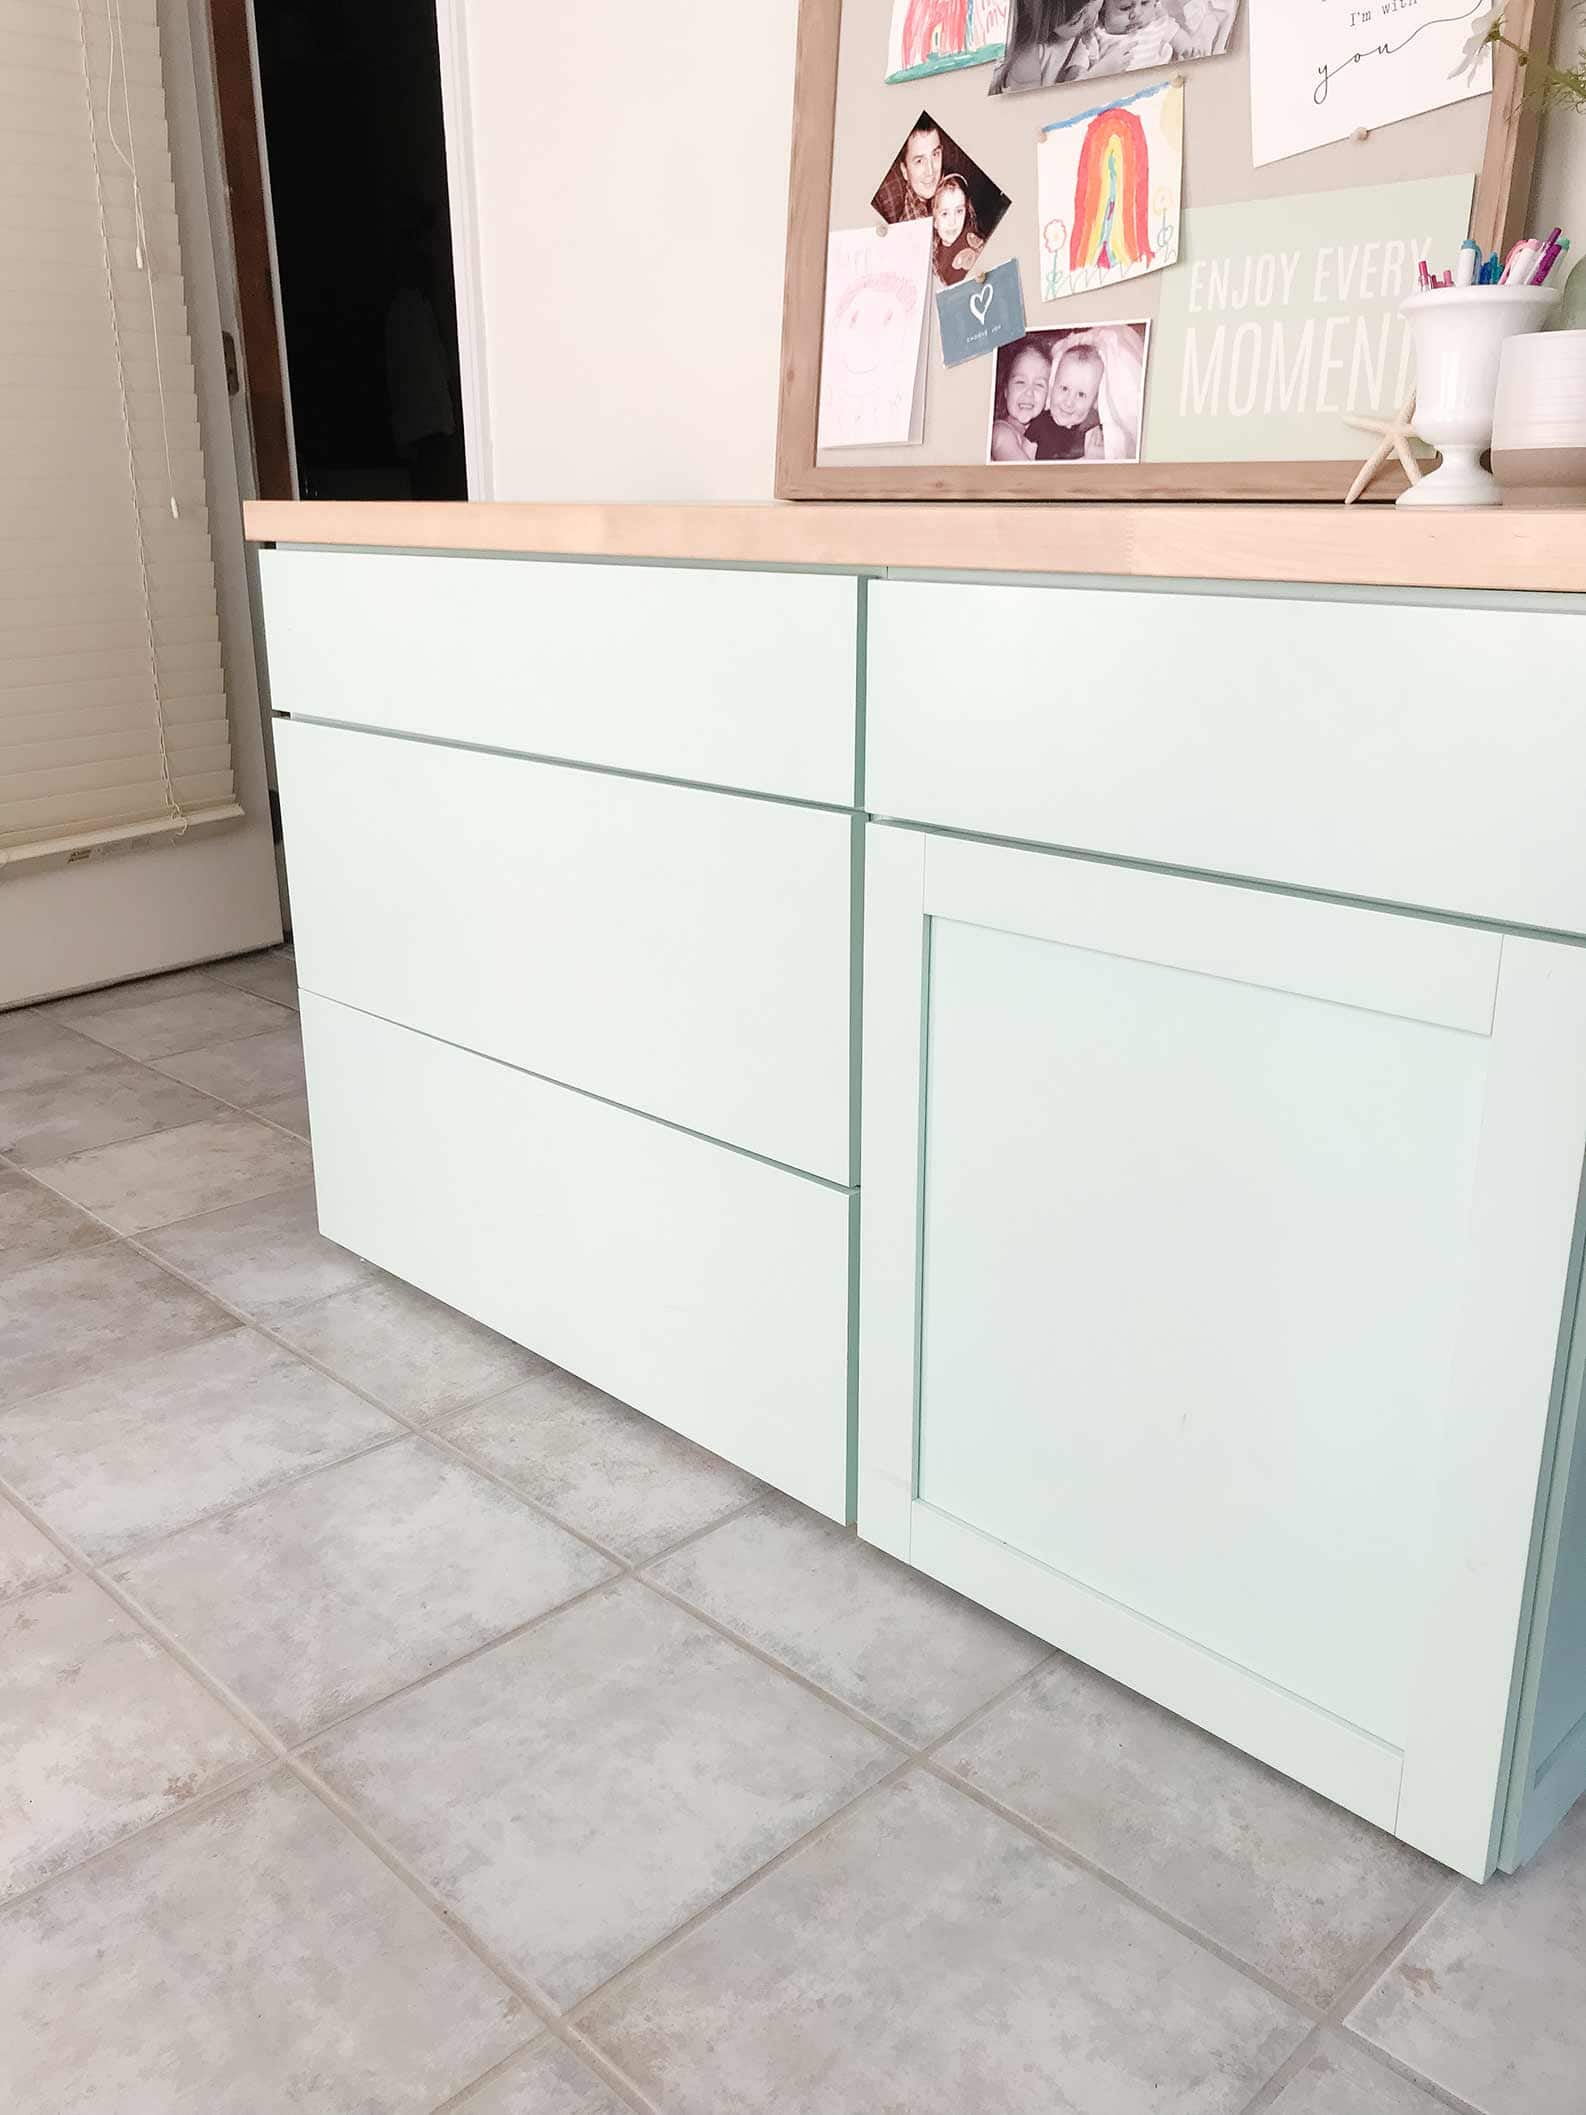 coastal office makeover featuring office decorating ideas and coastal decor. Teal aqua blue desk cabinets and diy butcher block desktop